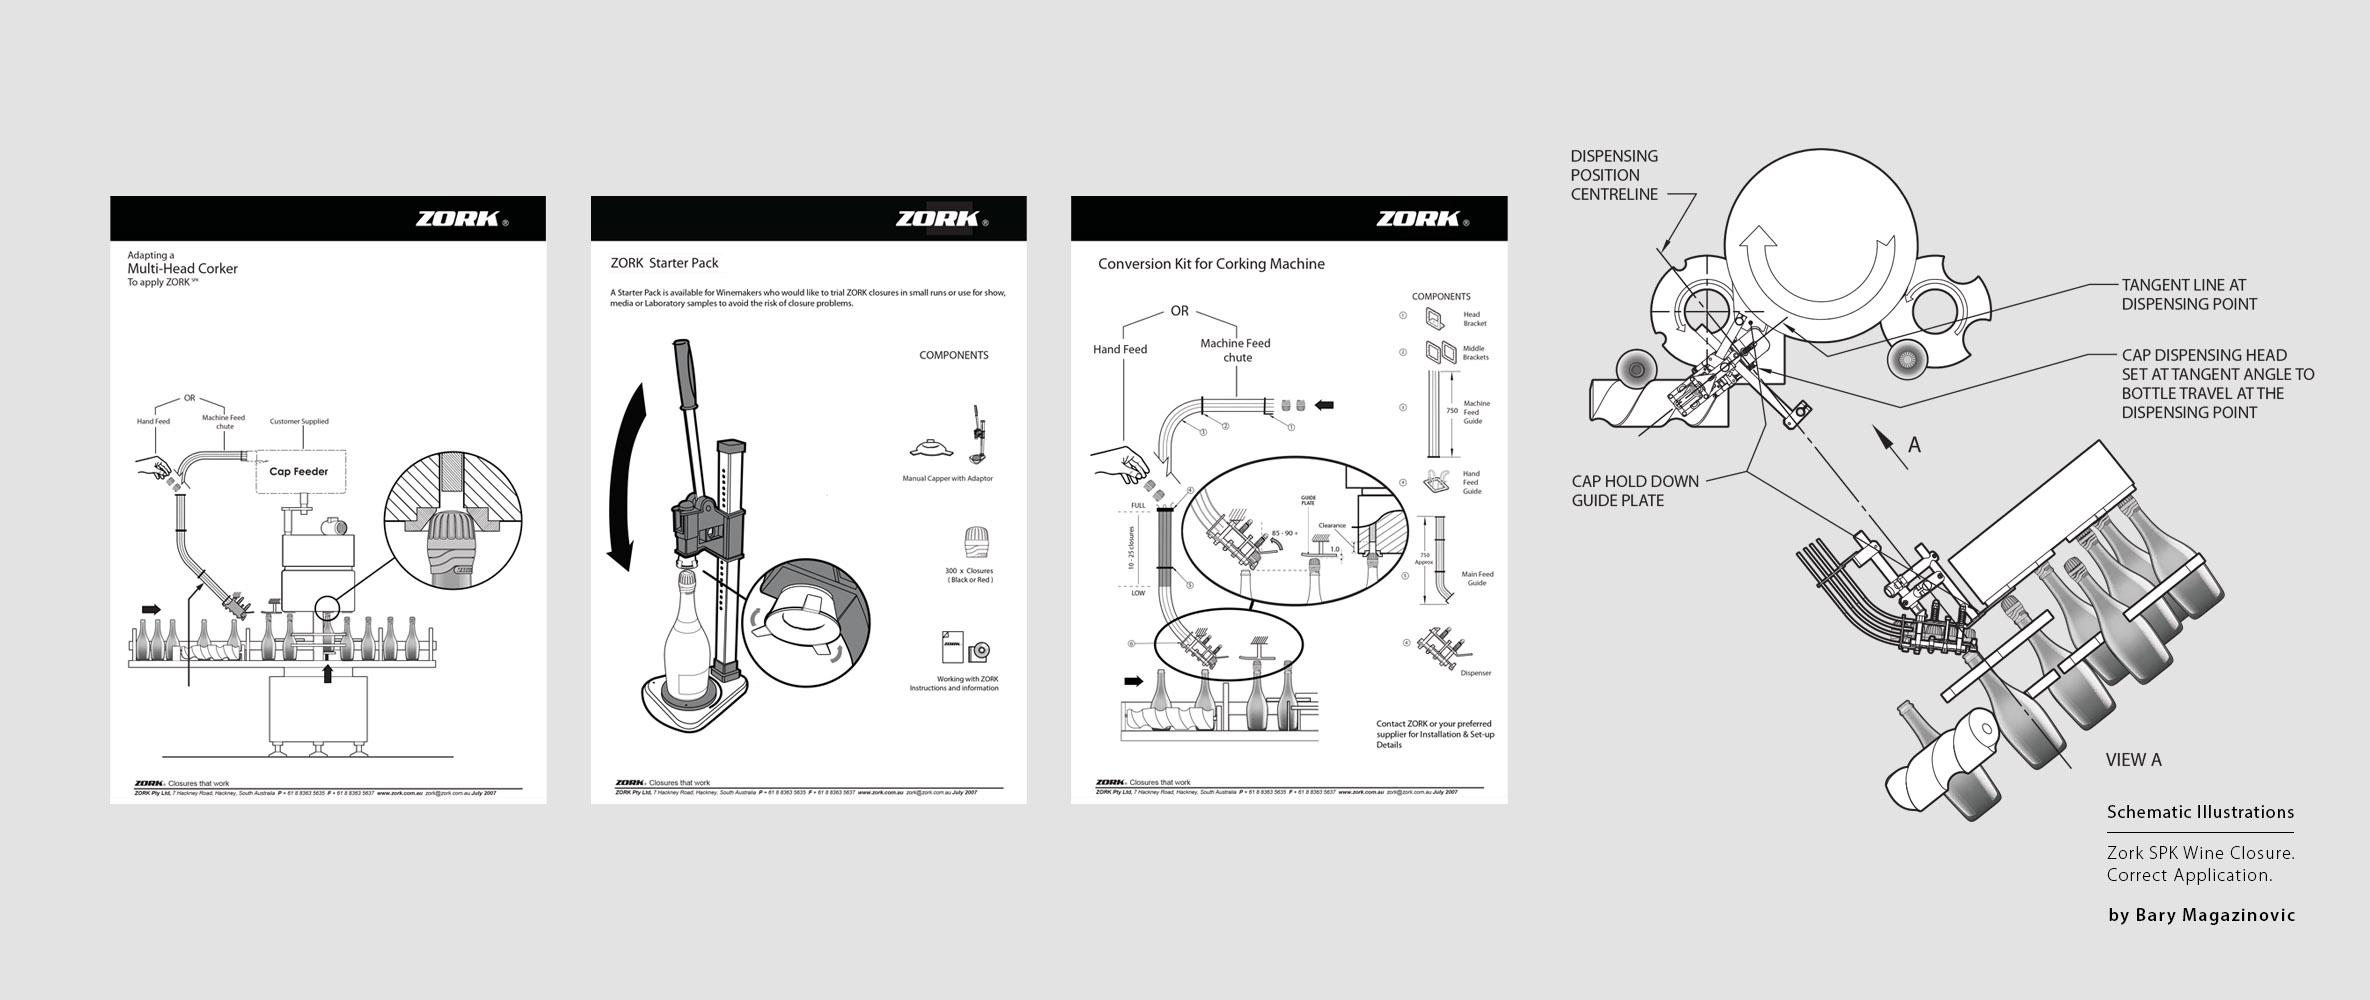 Australian Product Design Industrial Design SPK sparkling Champagne correct application illustrations by Barry Magazinovic